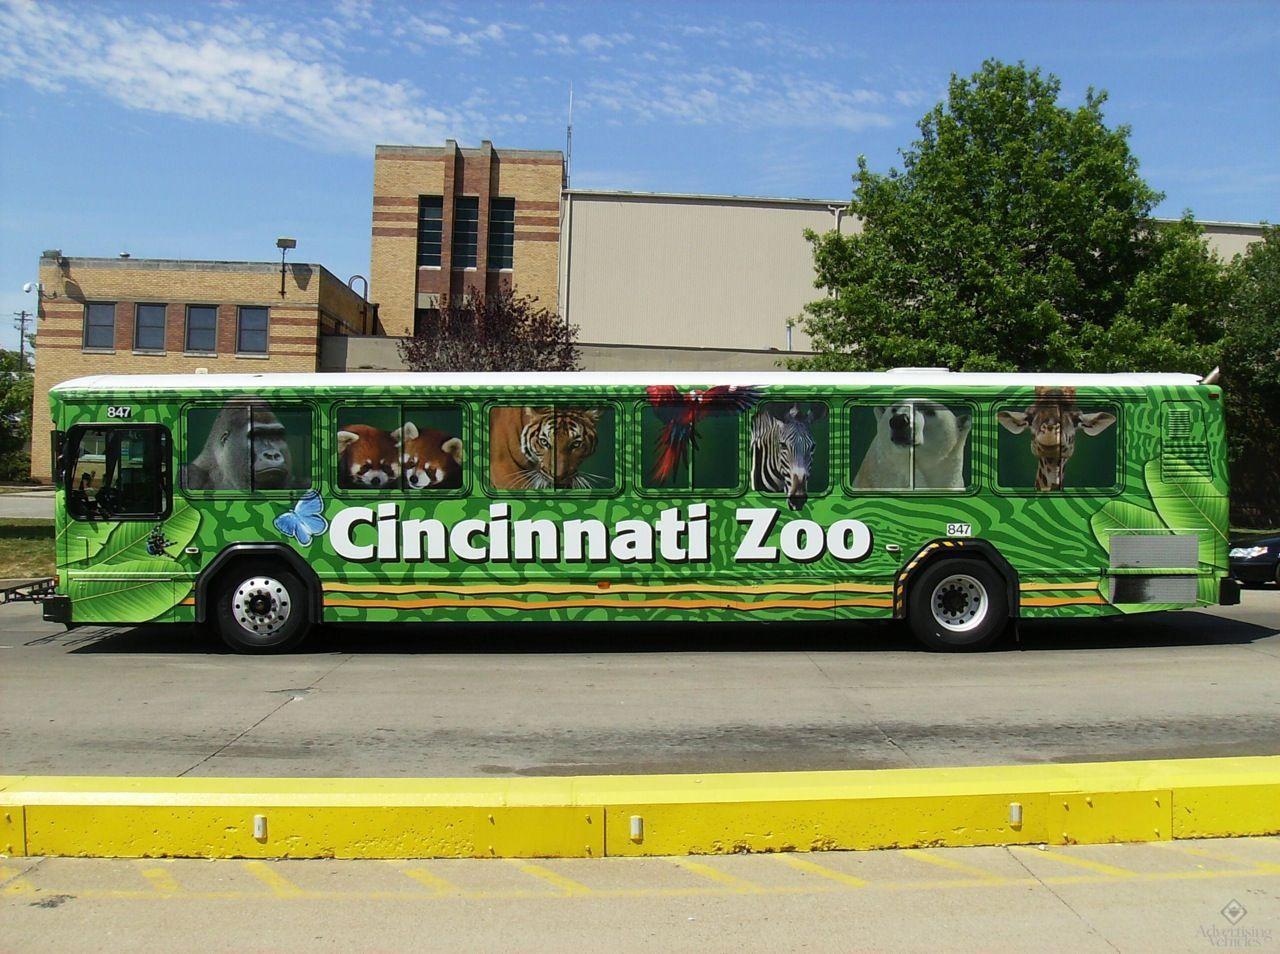 Cincinnati Zoo Bus Wrap